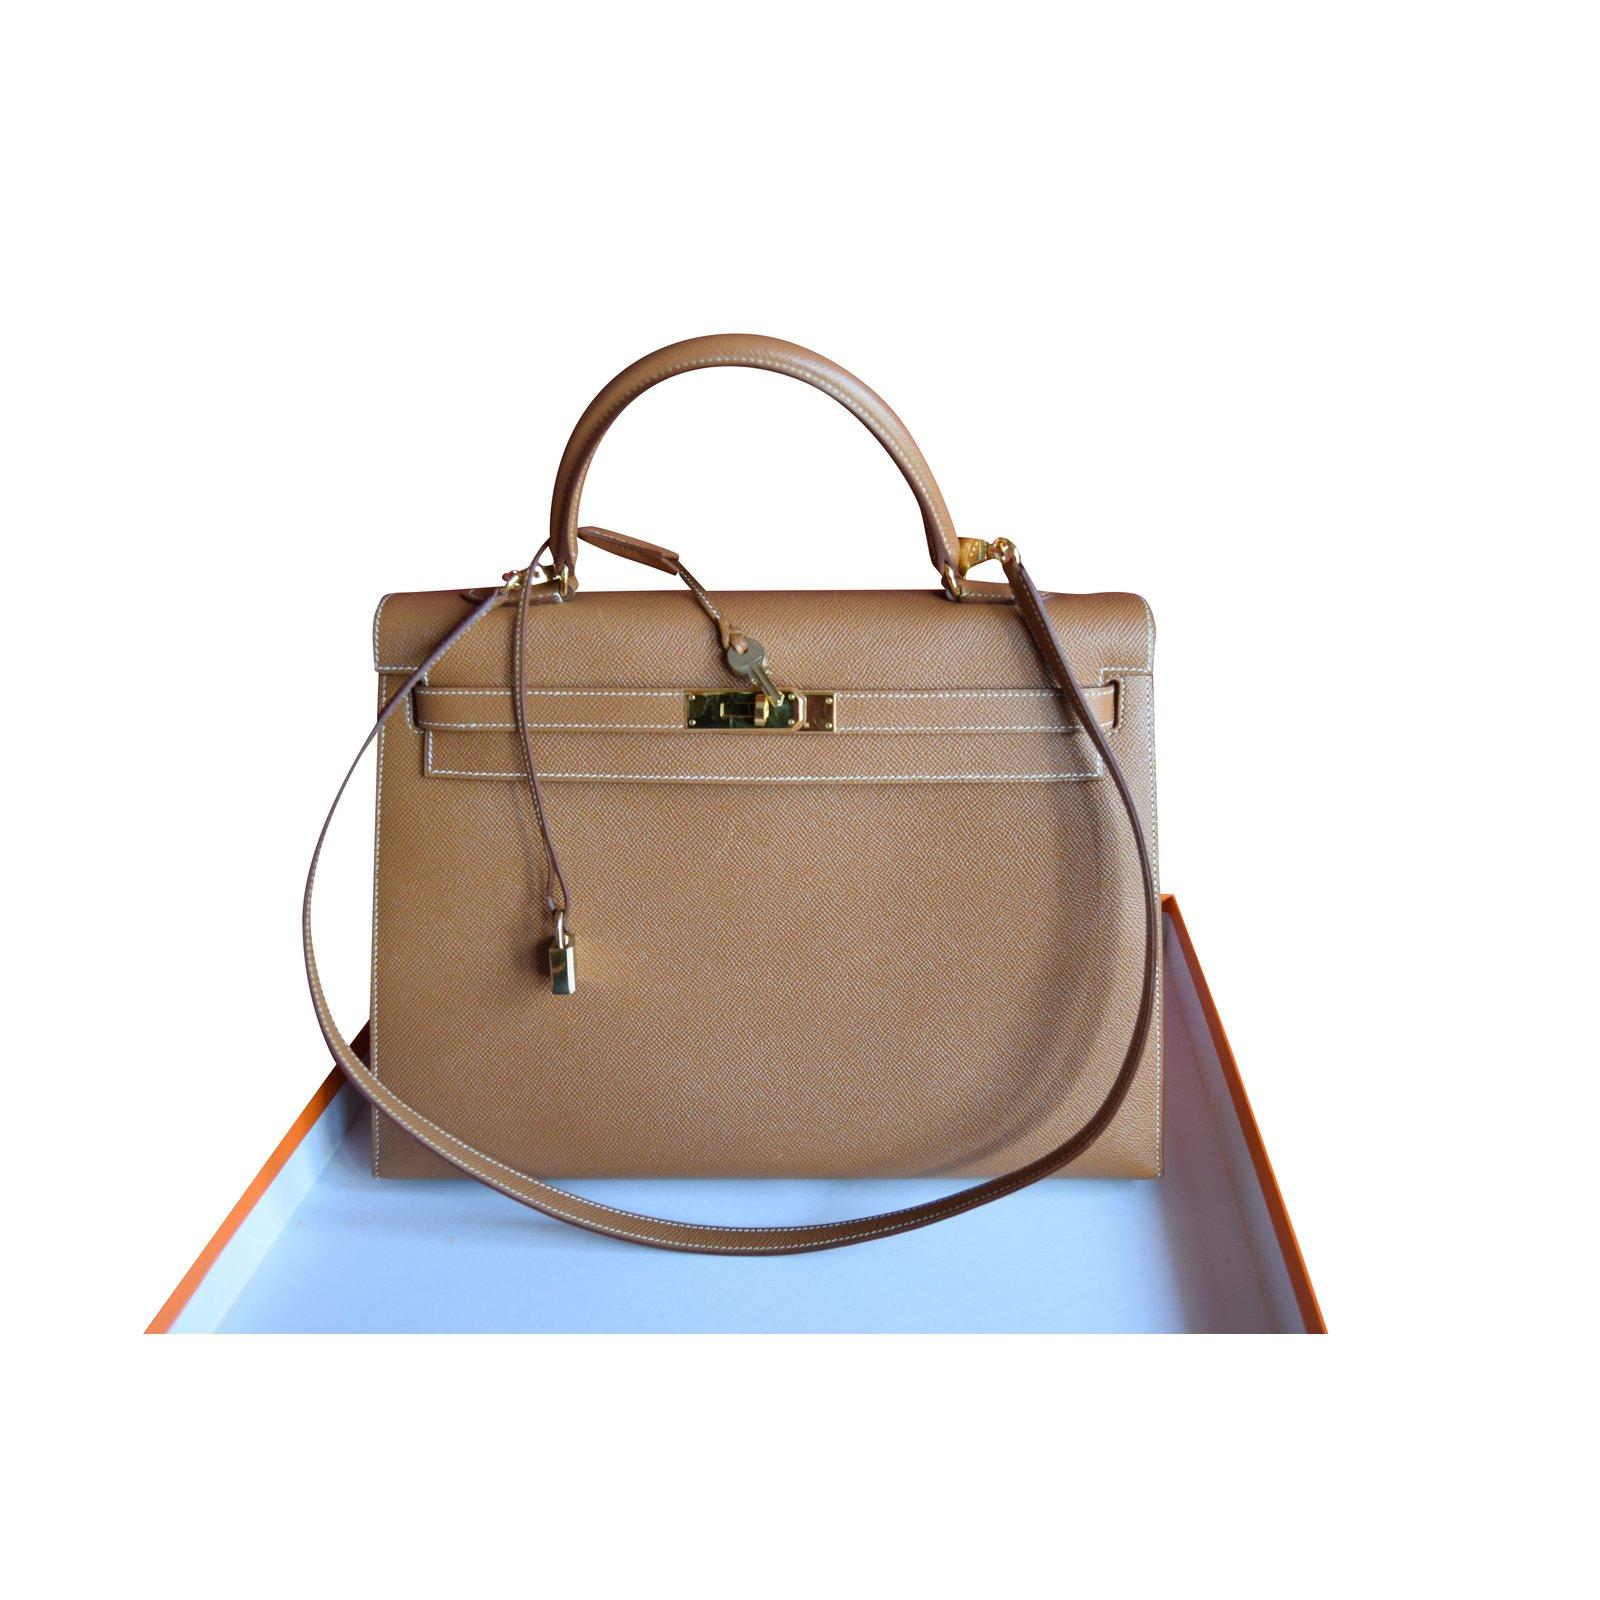 Hermès Kelly Bag Gilled Veau Courchevel Handbags Leather